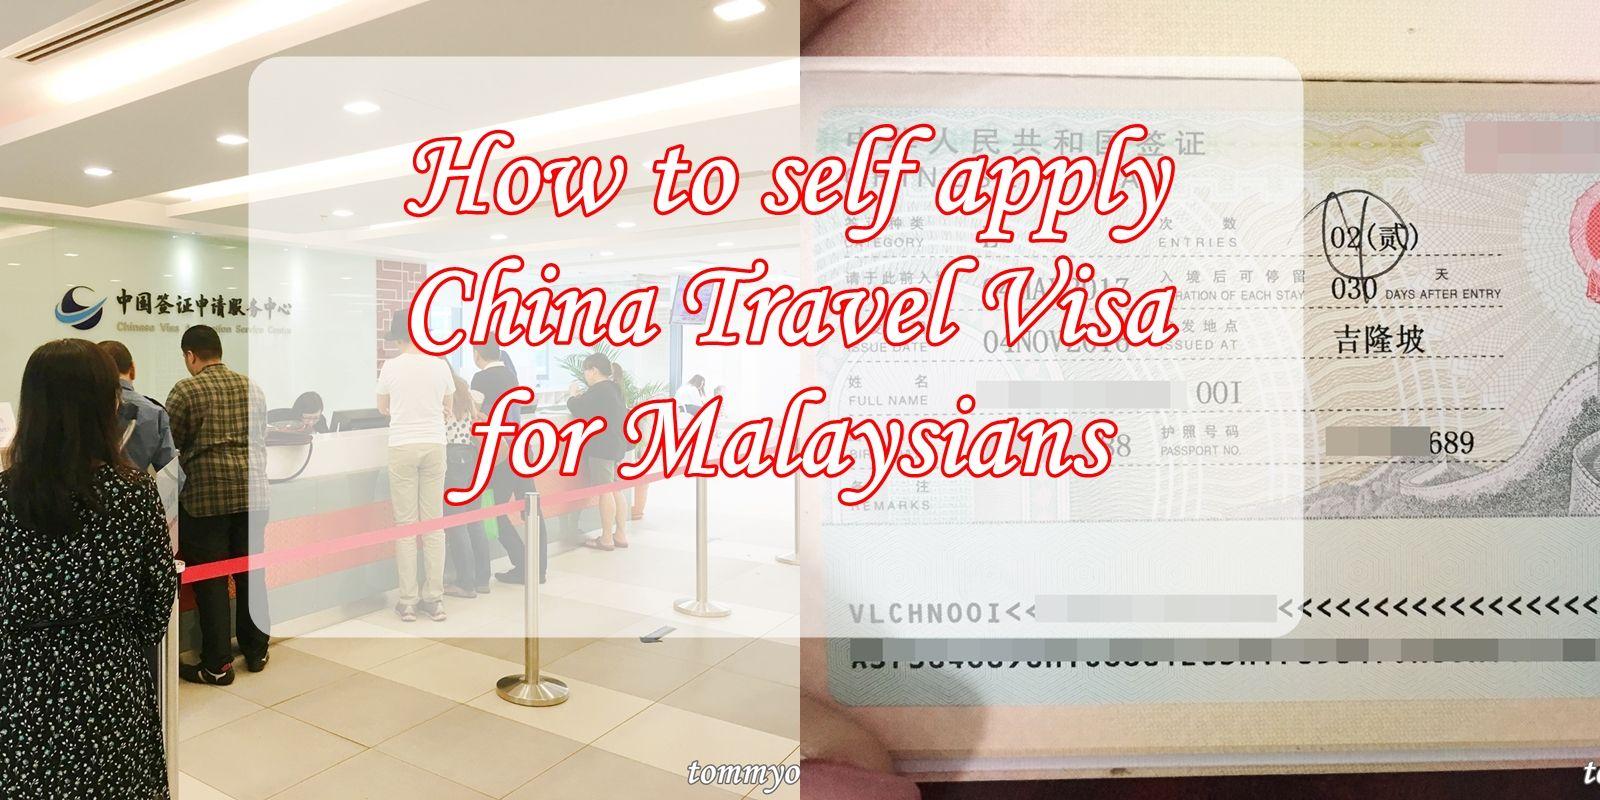 dating.com reviews 2017 uk visa requirements